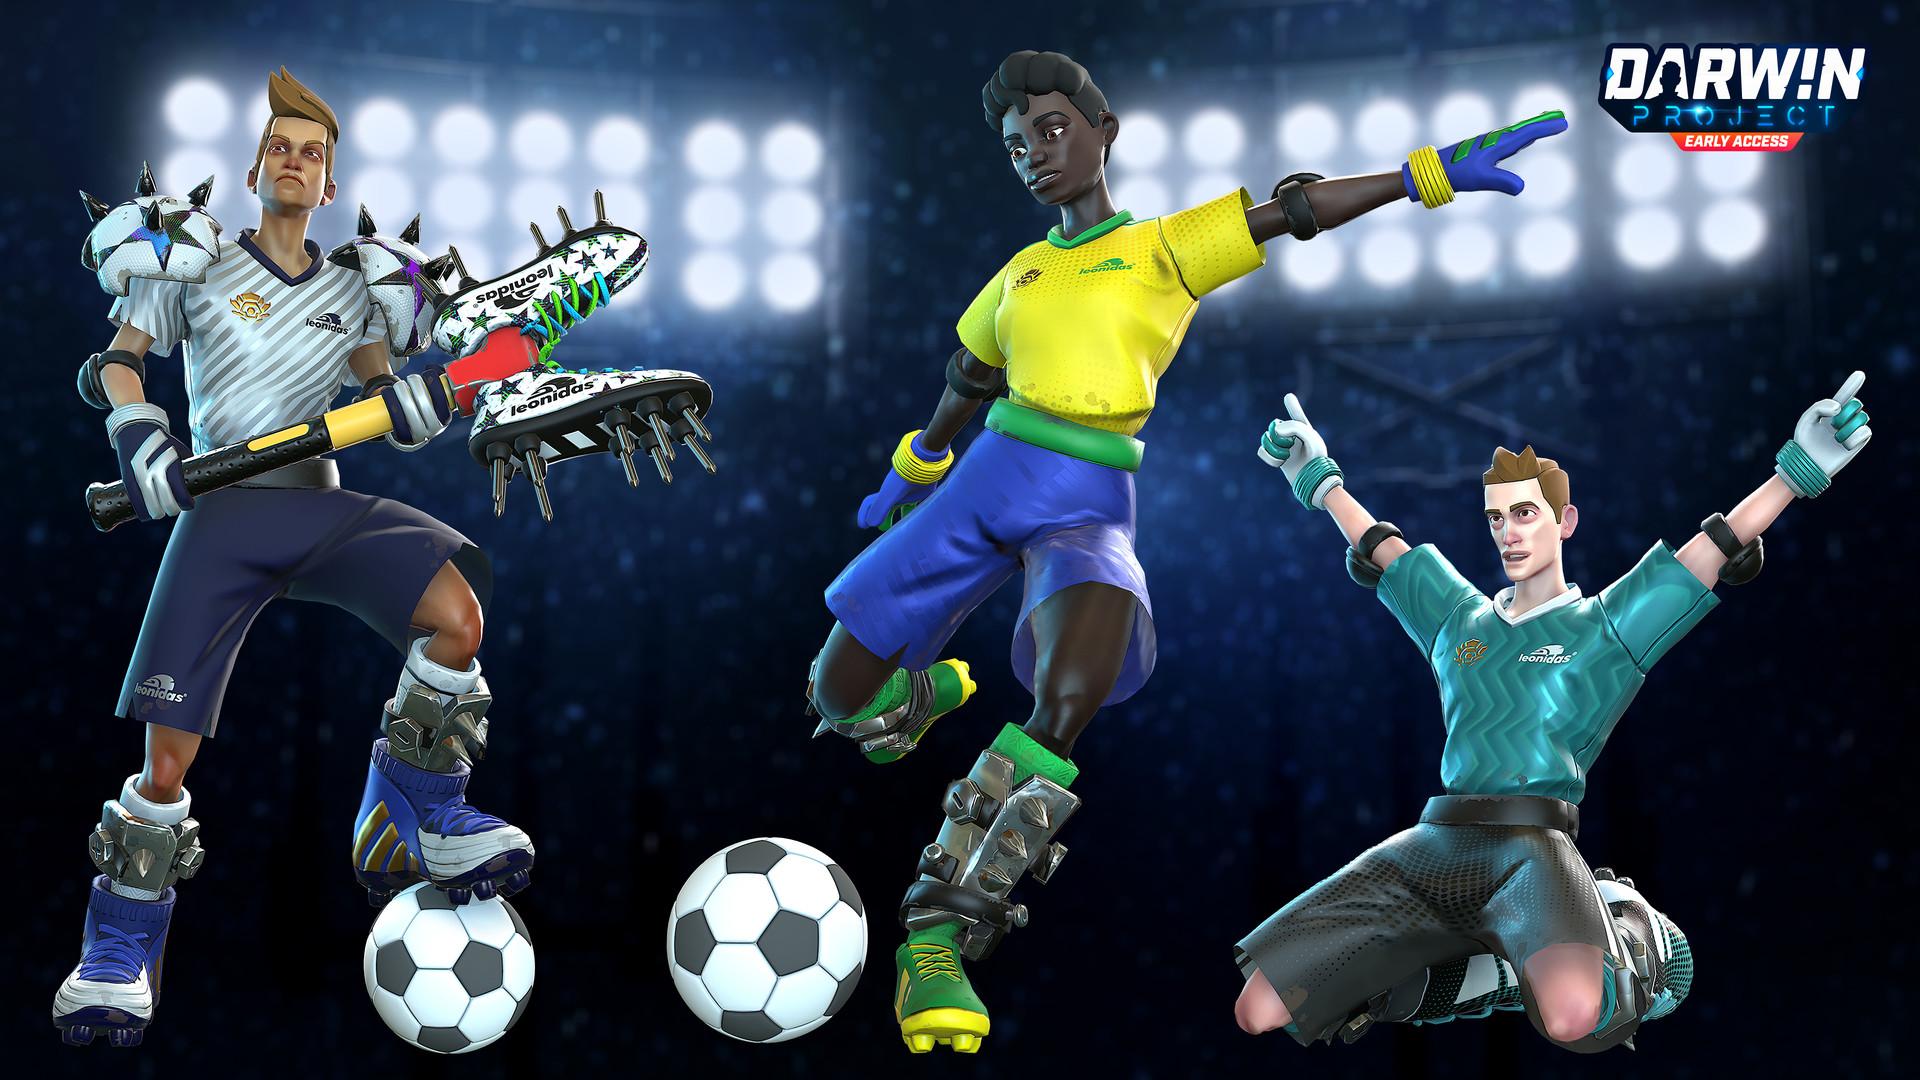 Felix arsenault soccereventa